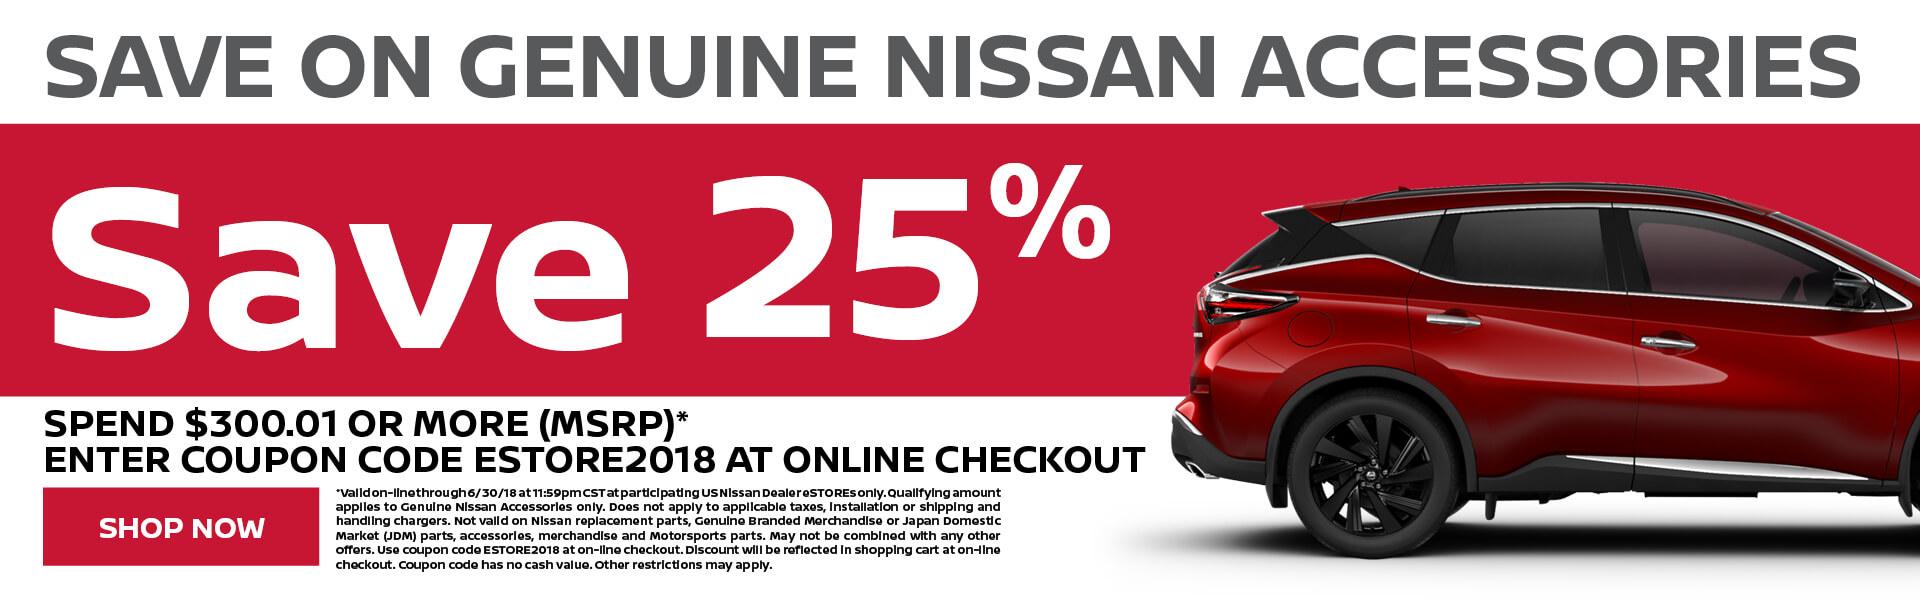 Nissan Accessories Save 25%